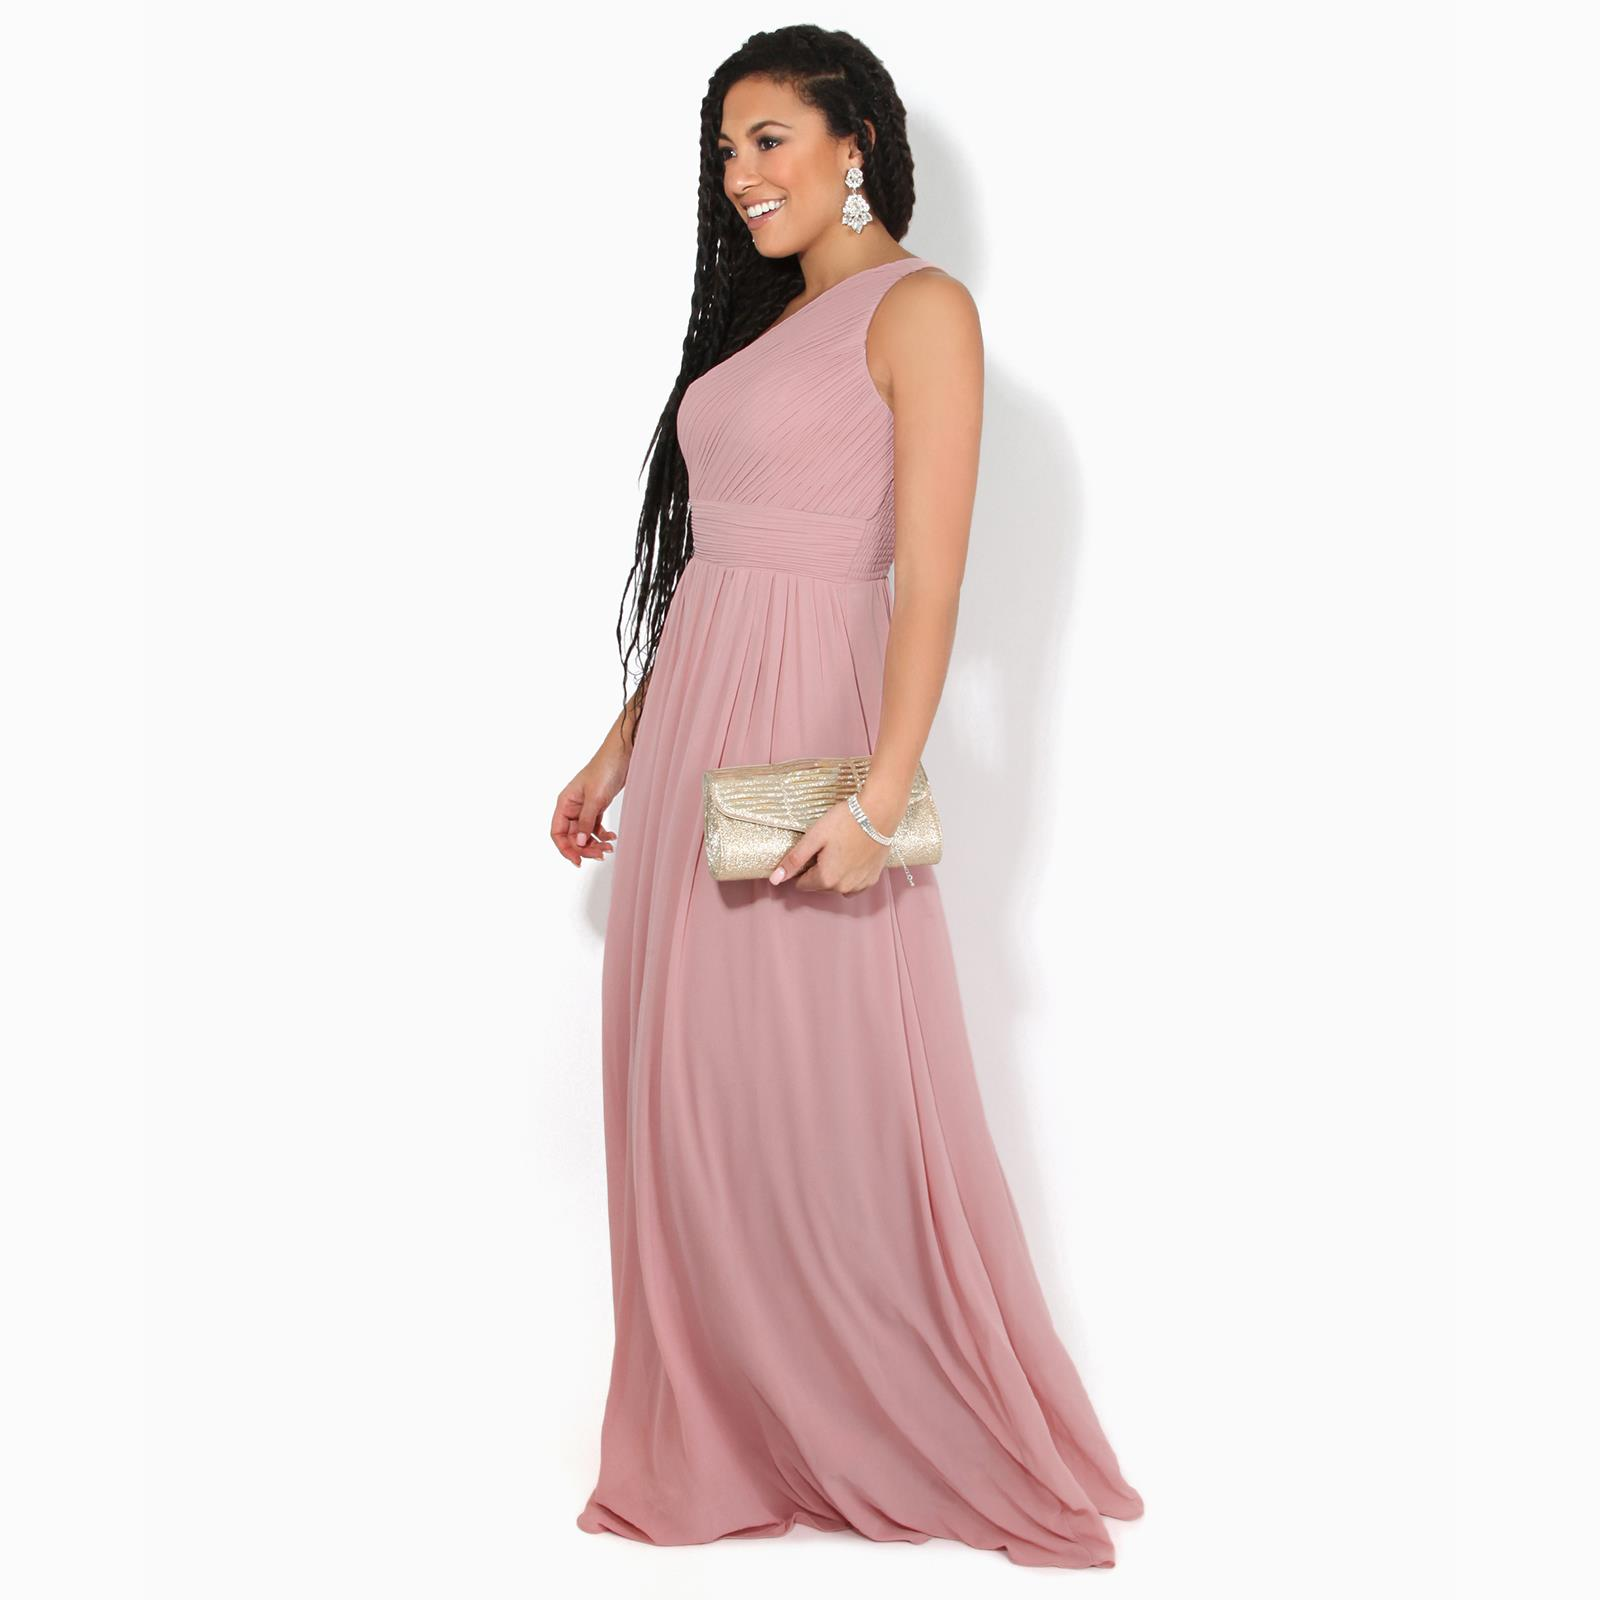 Womens-Wedding-Bridesmaid-Prom-Dress-Formal-One-Off-Shoulder-Long-Evening-8-18 thumbnail 25